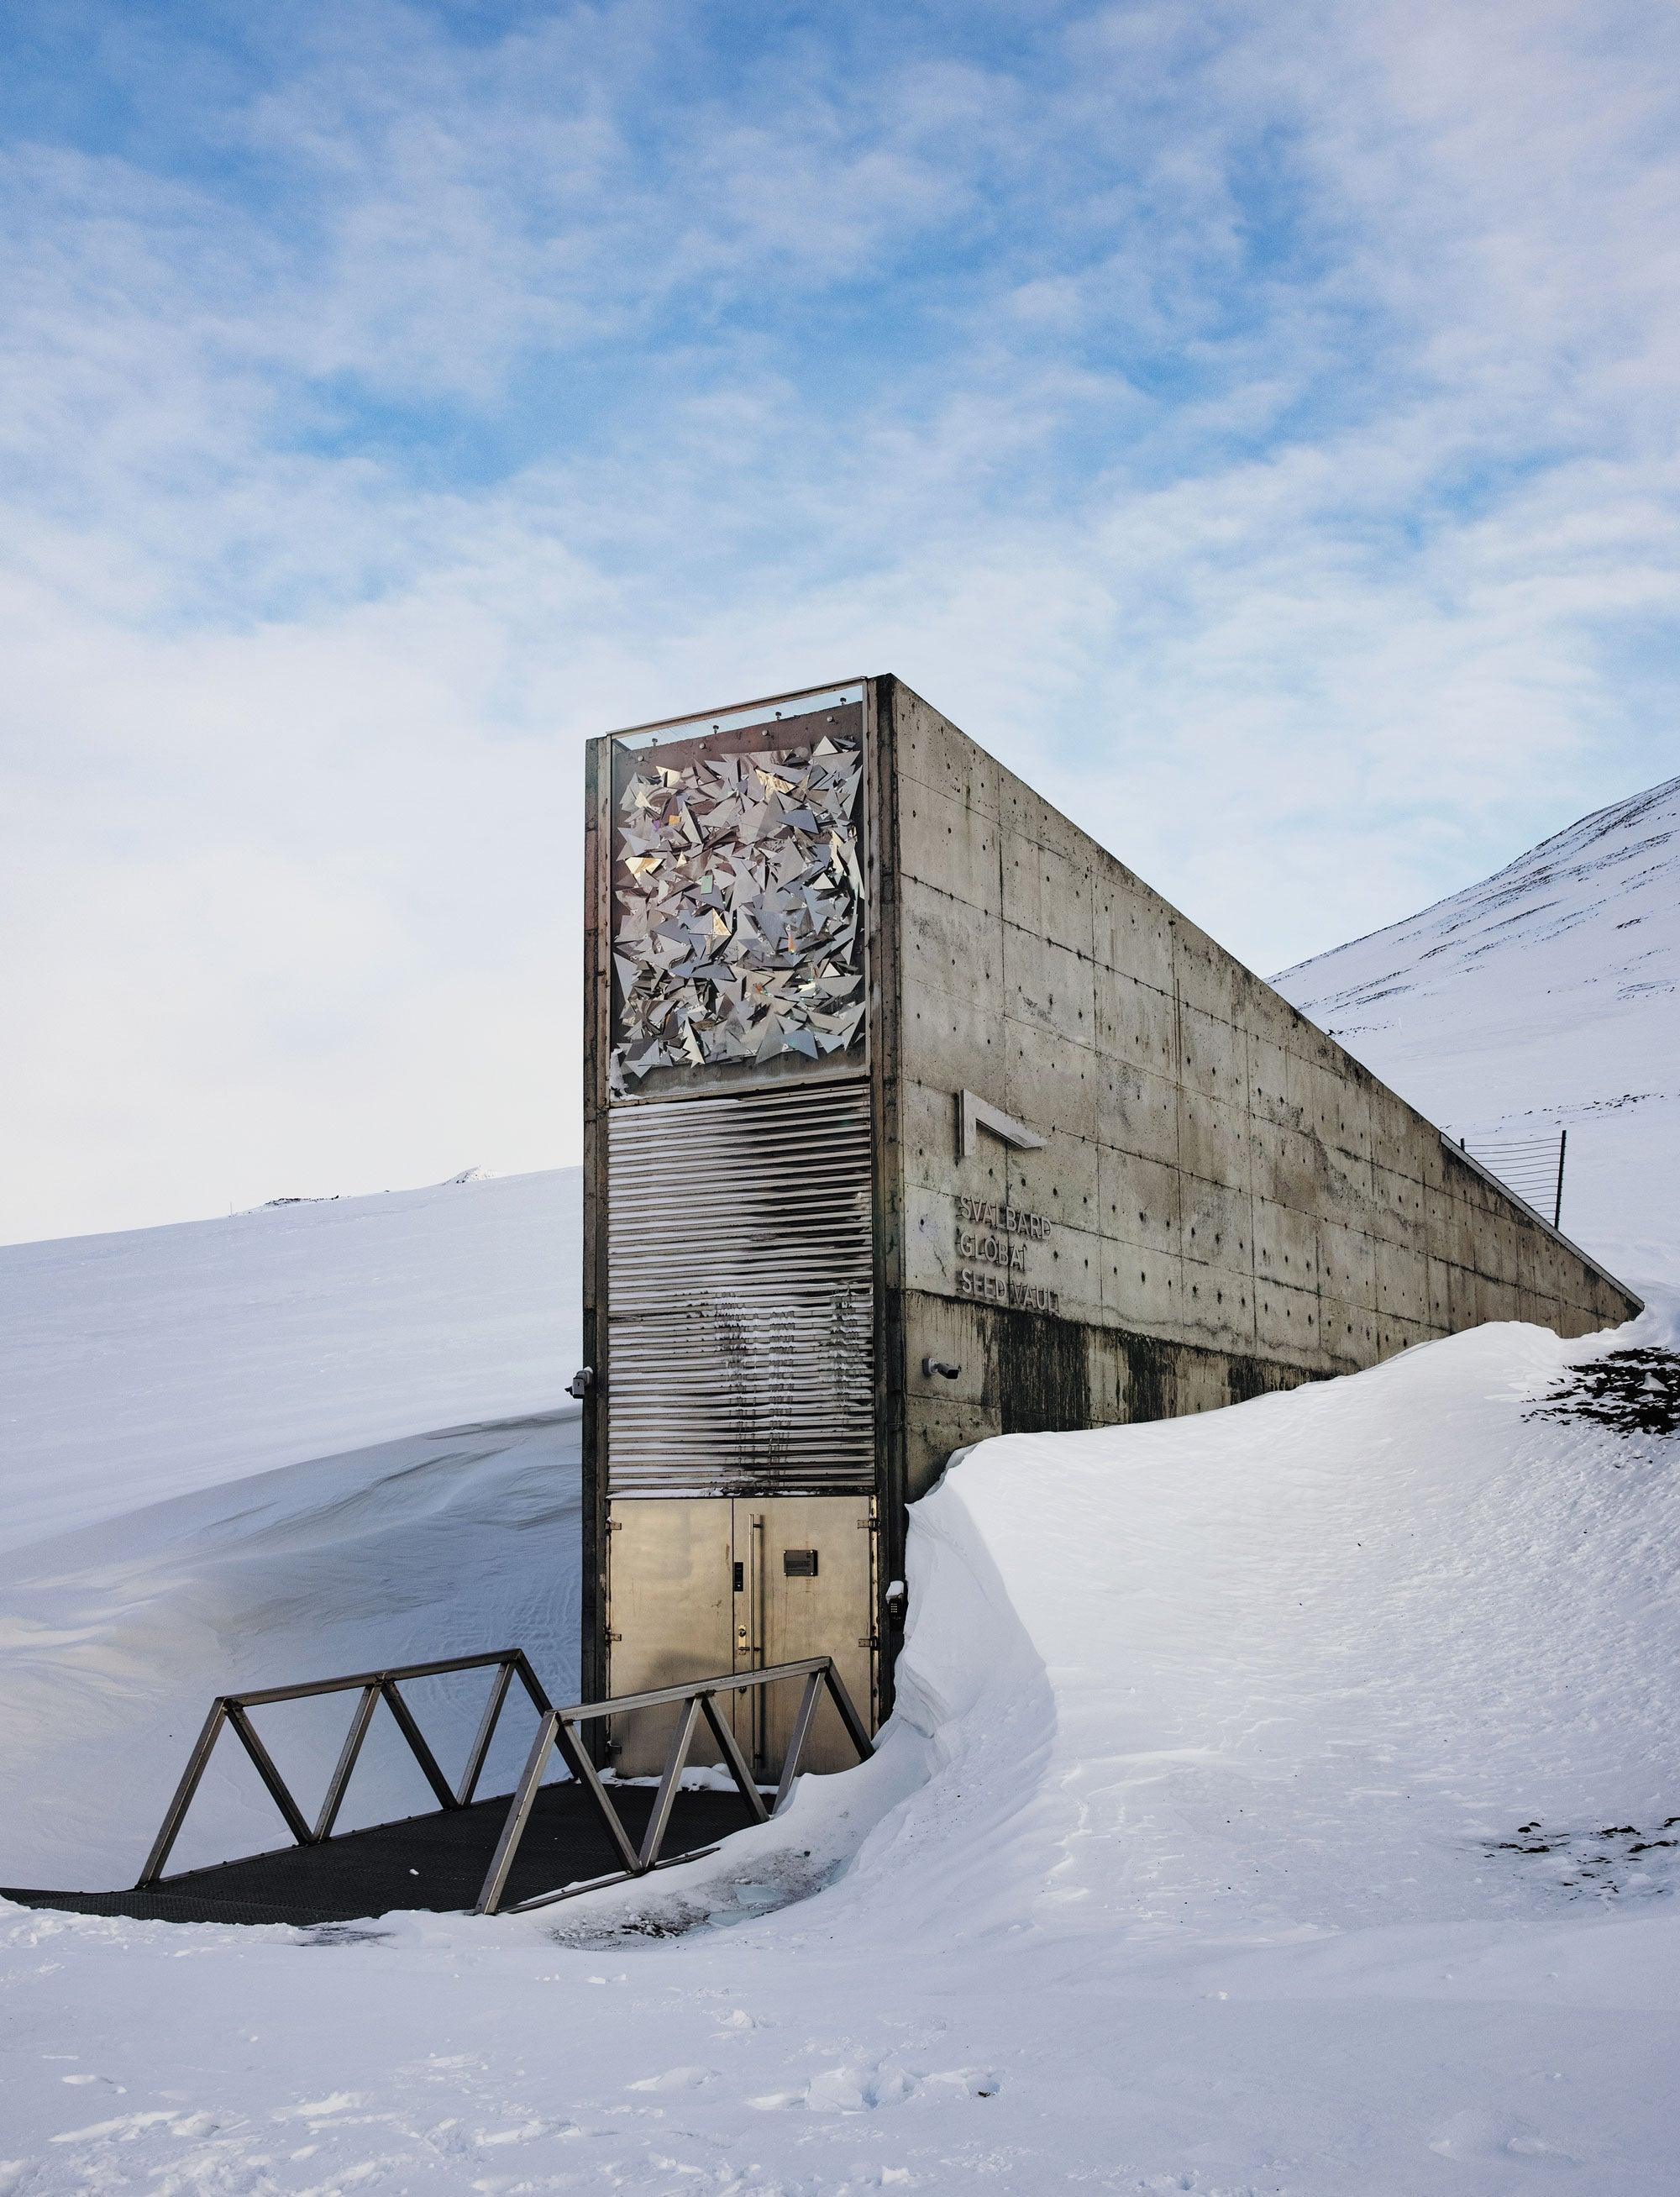 The Svalbard Global Seed Vault entrance